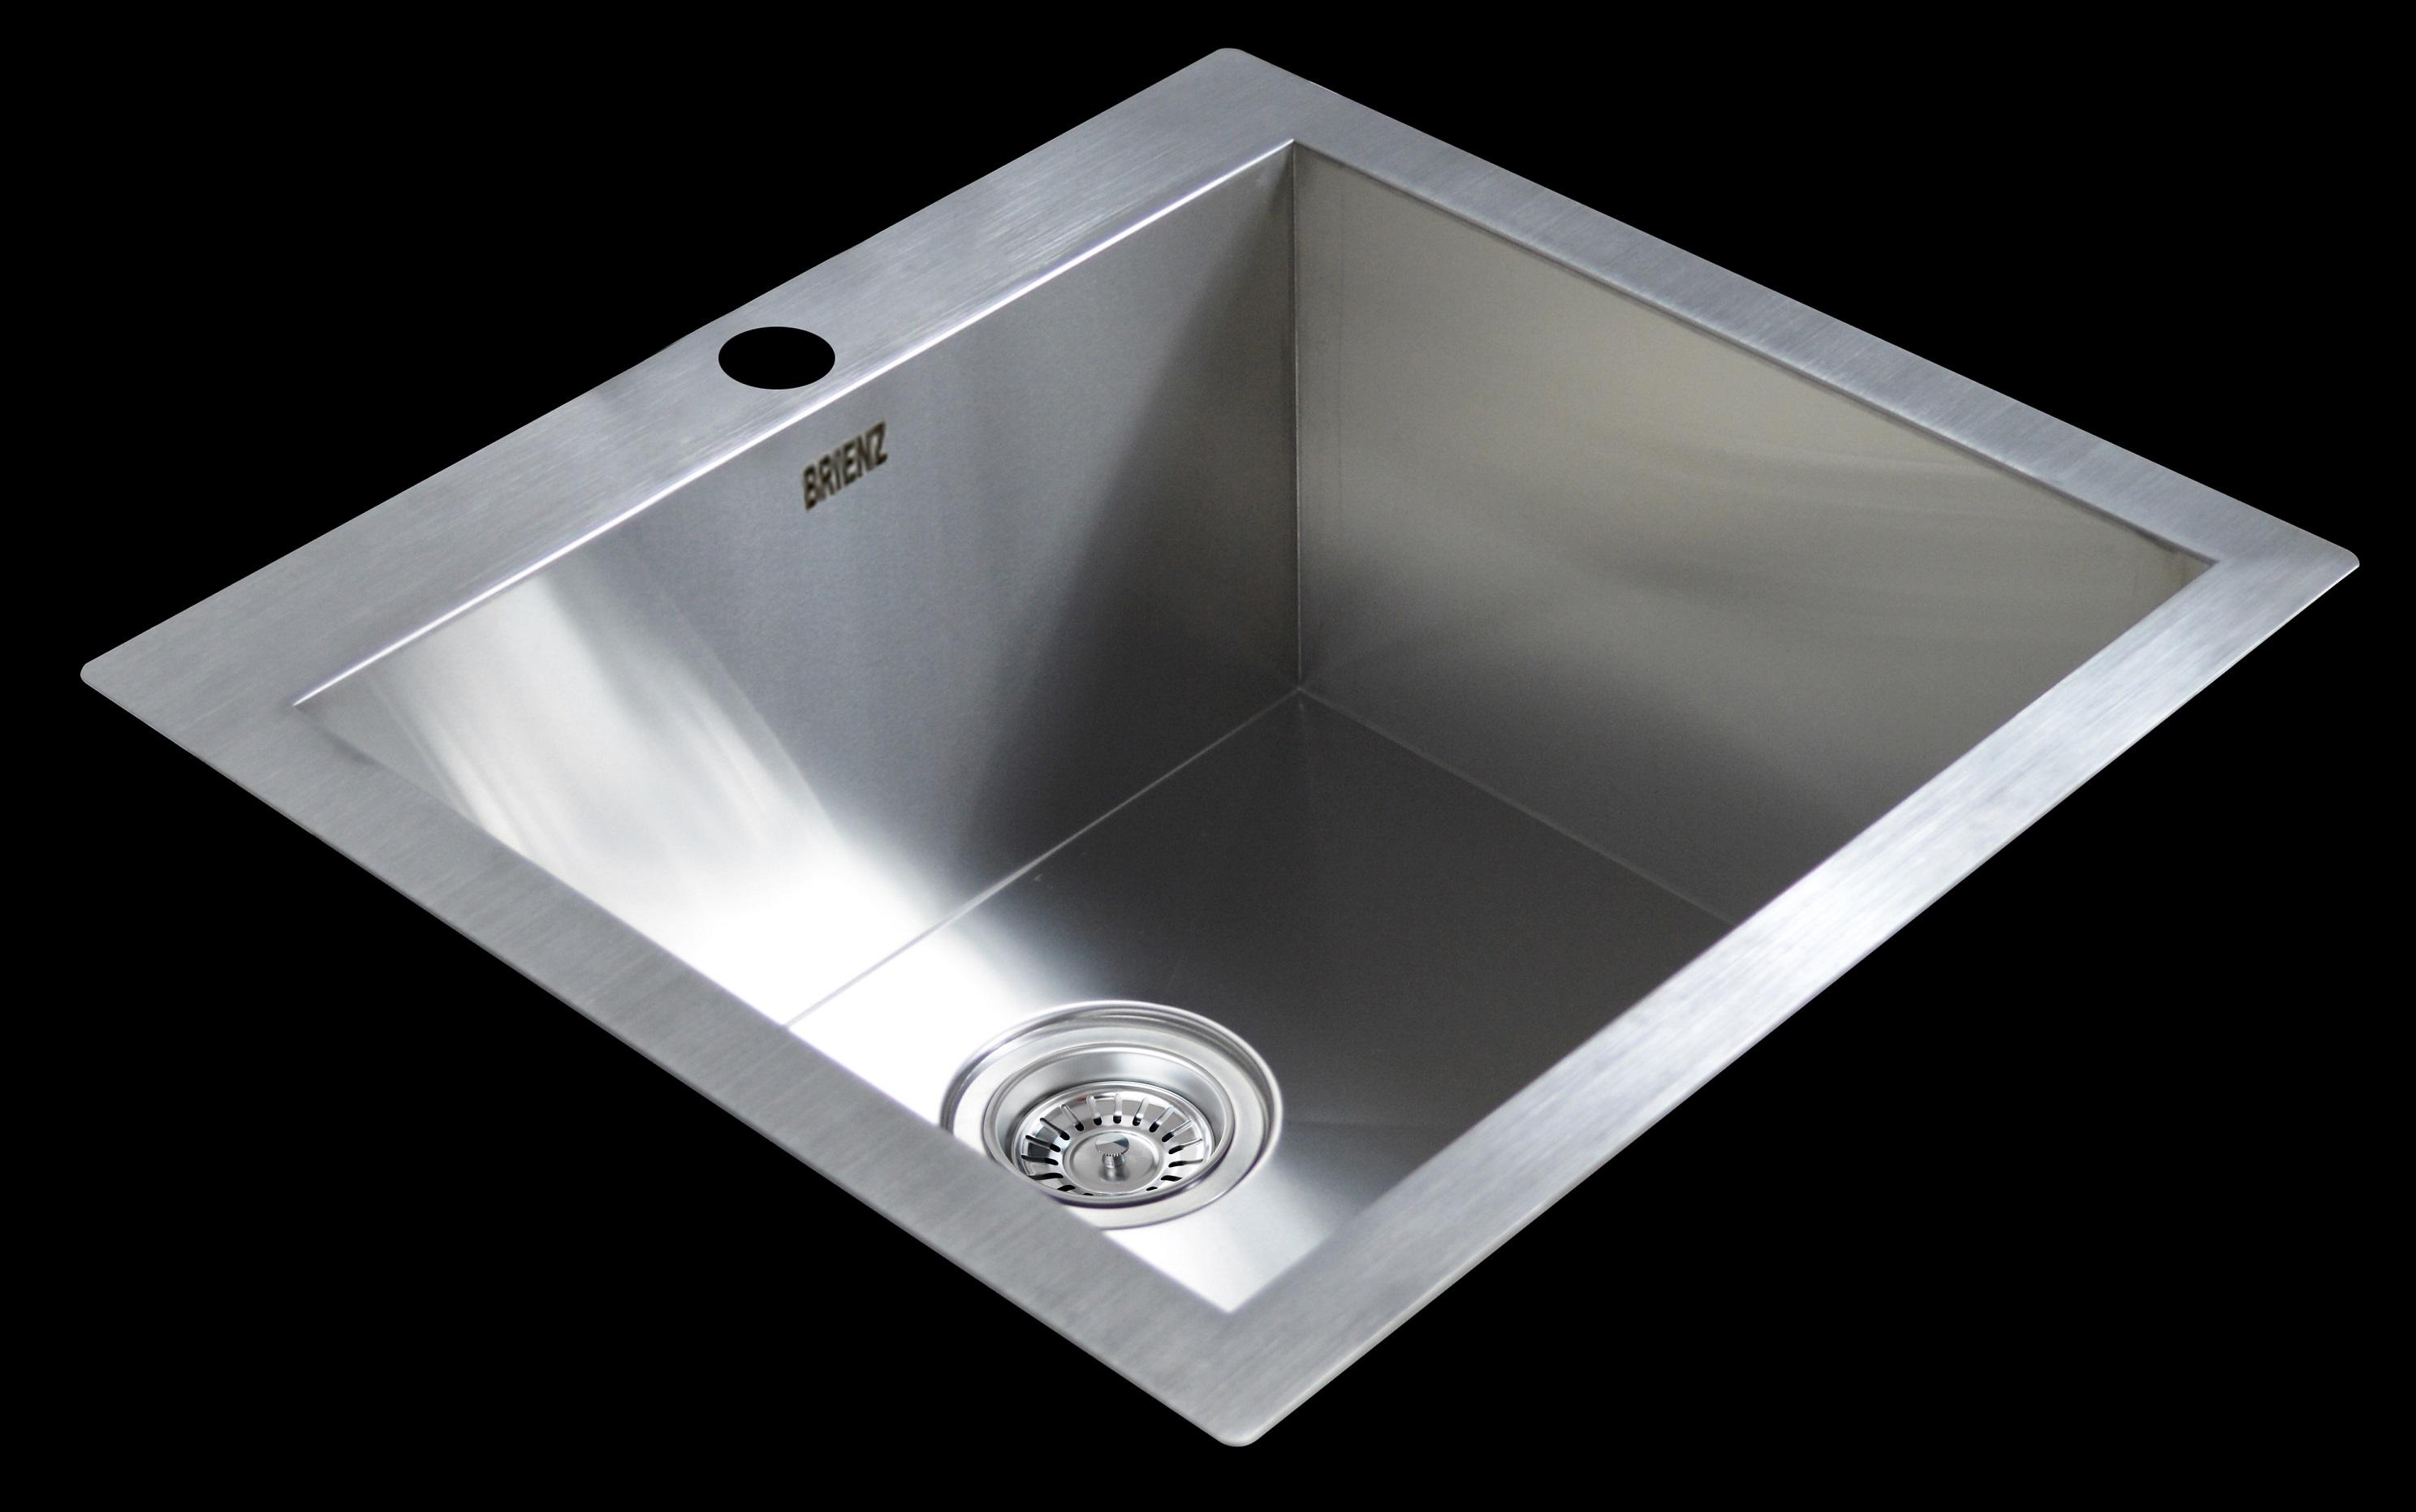 530x505mm Handmade Stainless Steel Topmount Kitchen Laundry Sink with Waste  Z2524